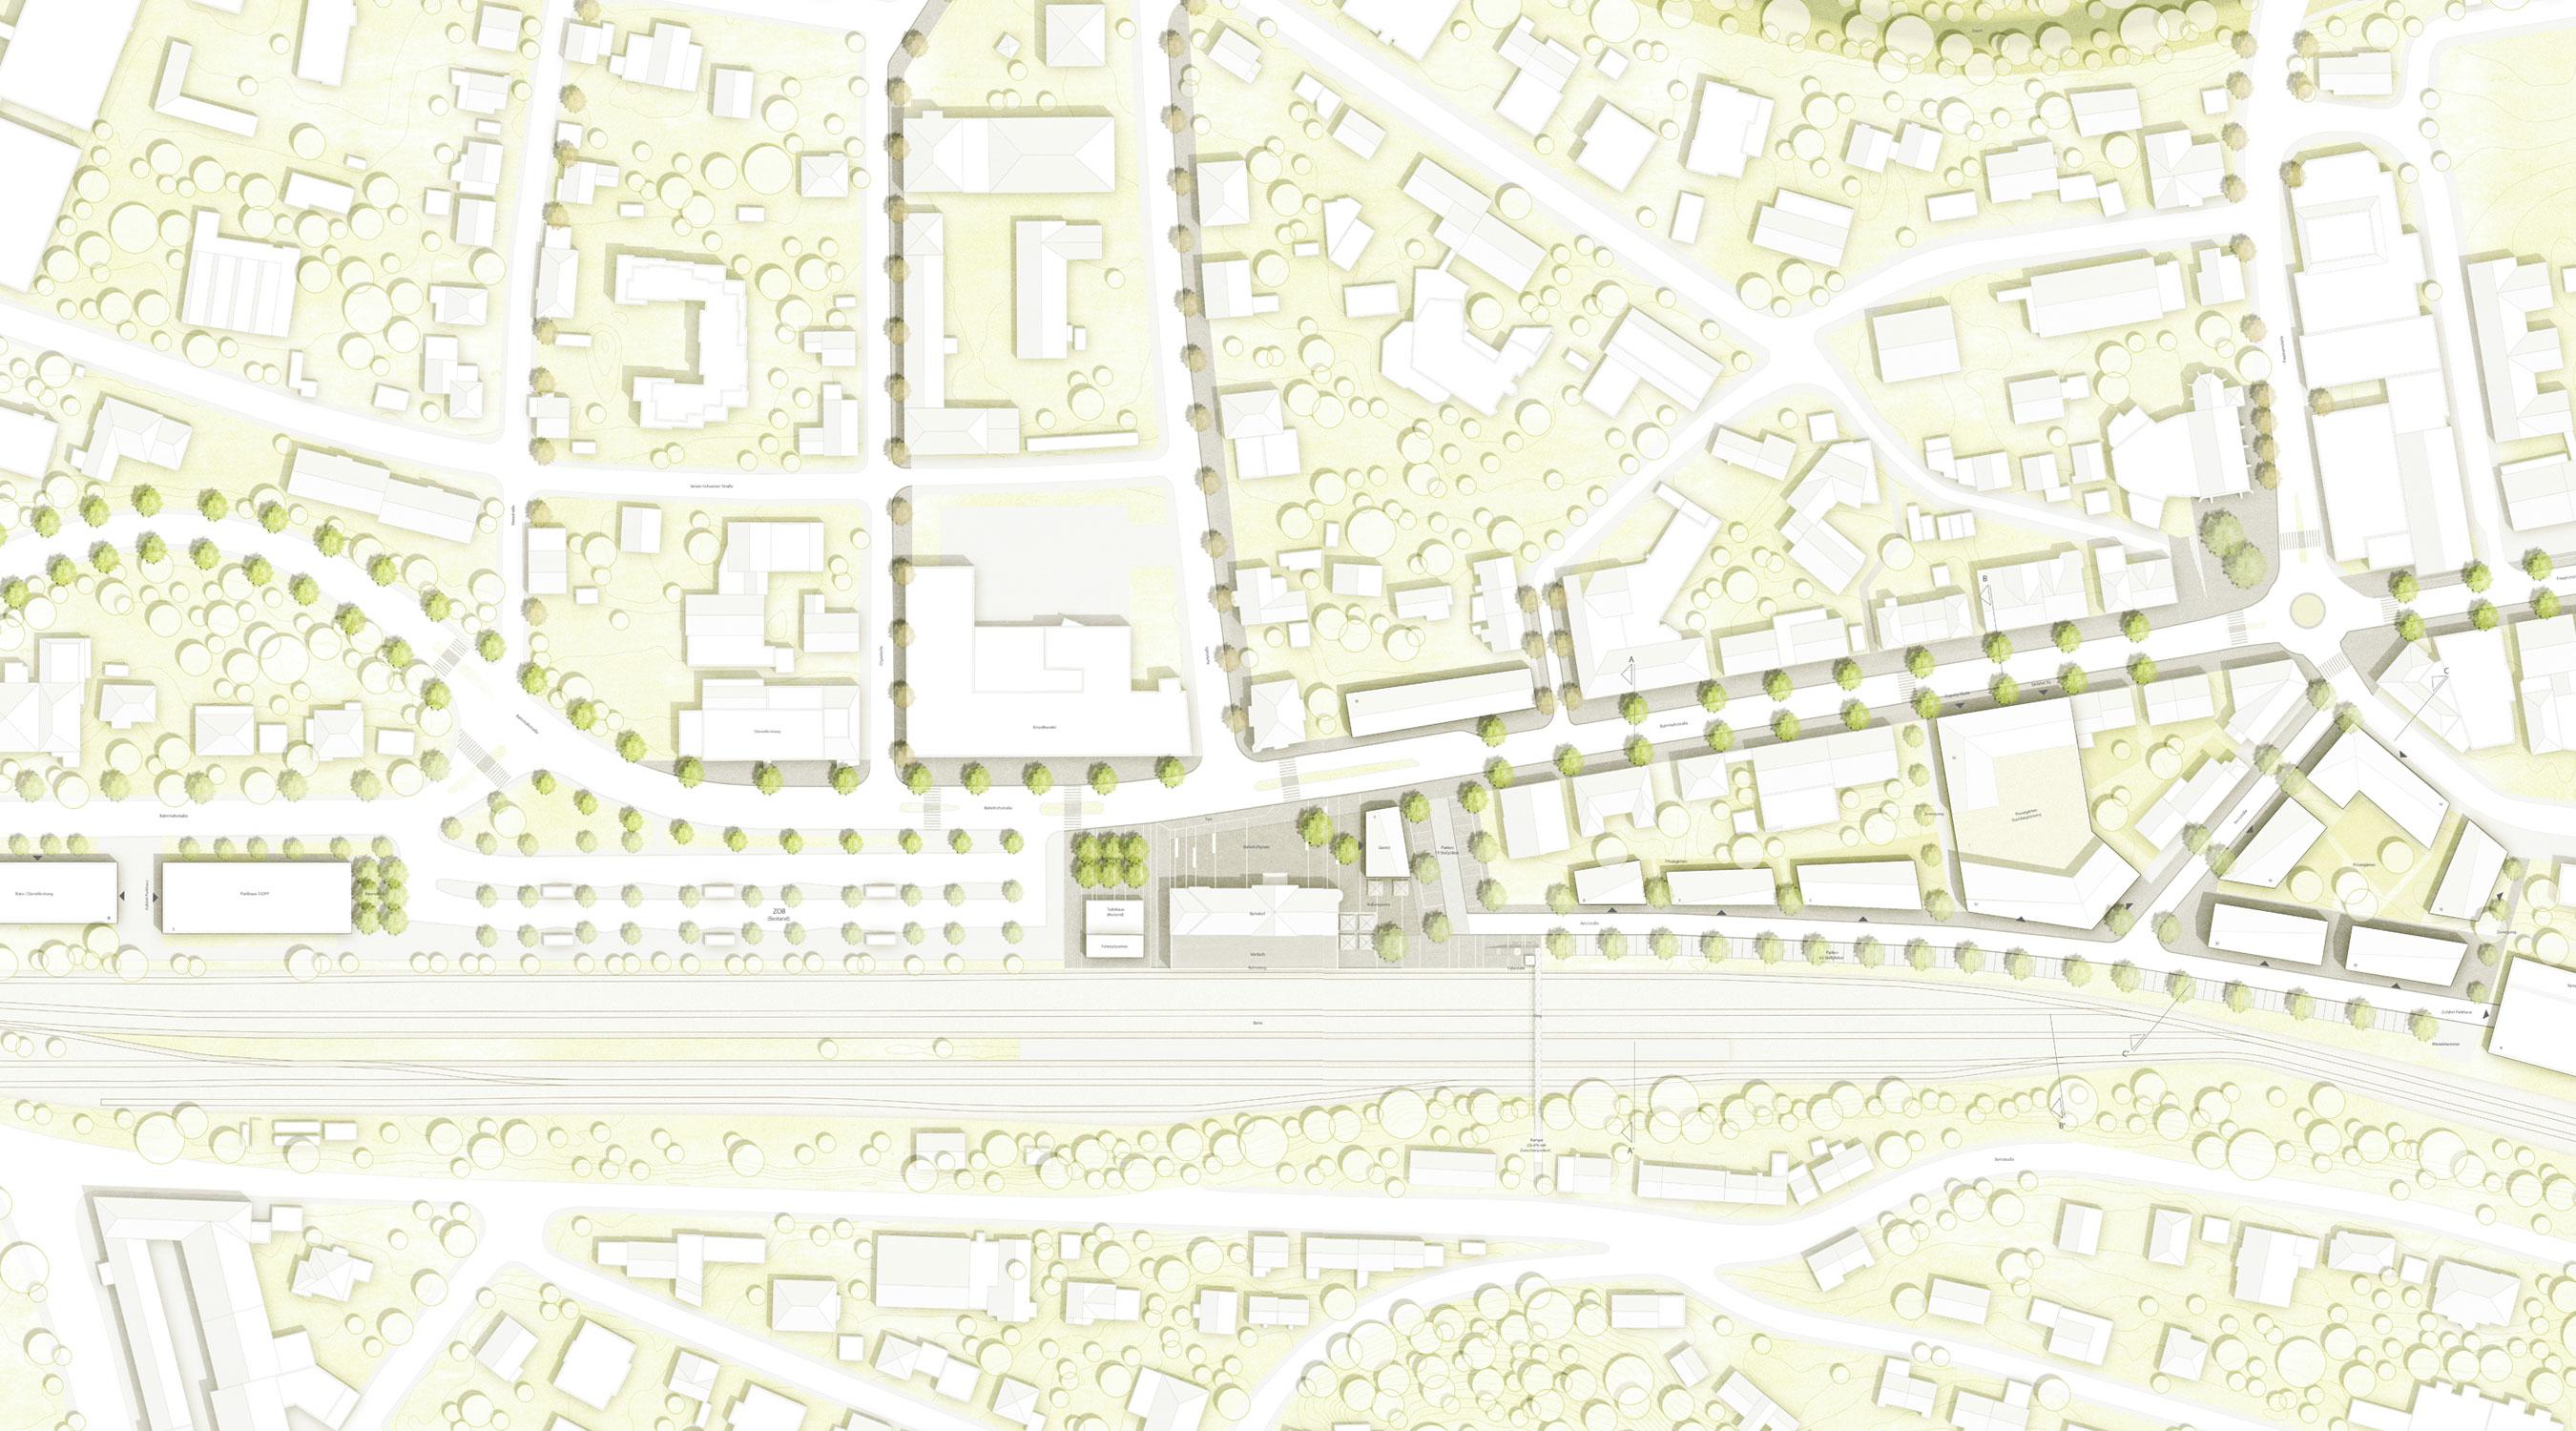 Bahnhofplatz Stadteingang Nord Balingen Lageplan